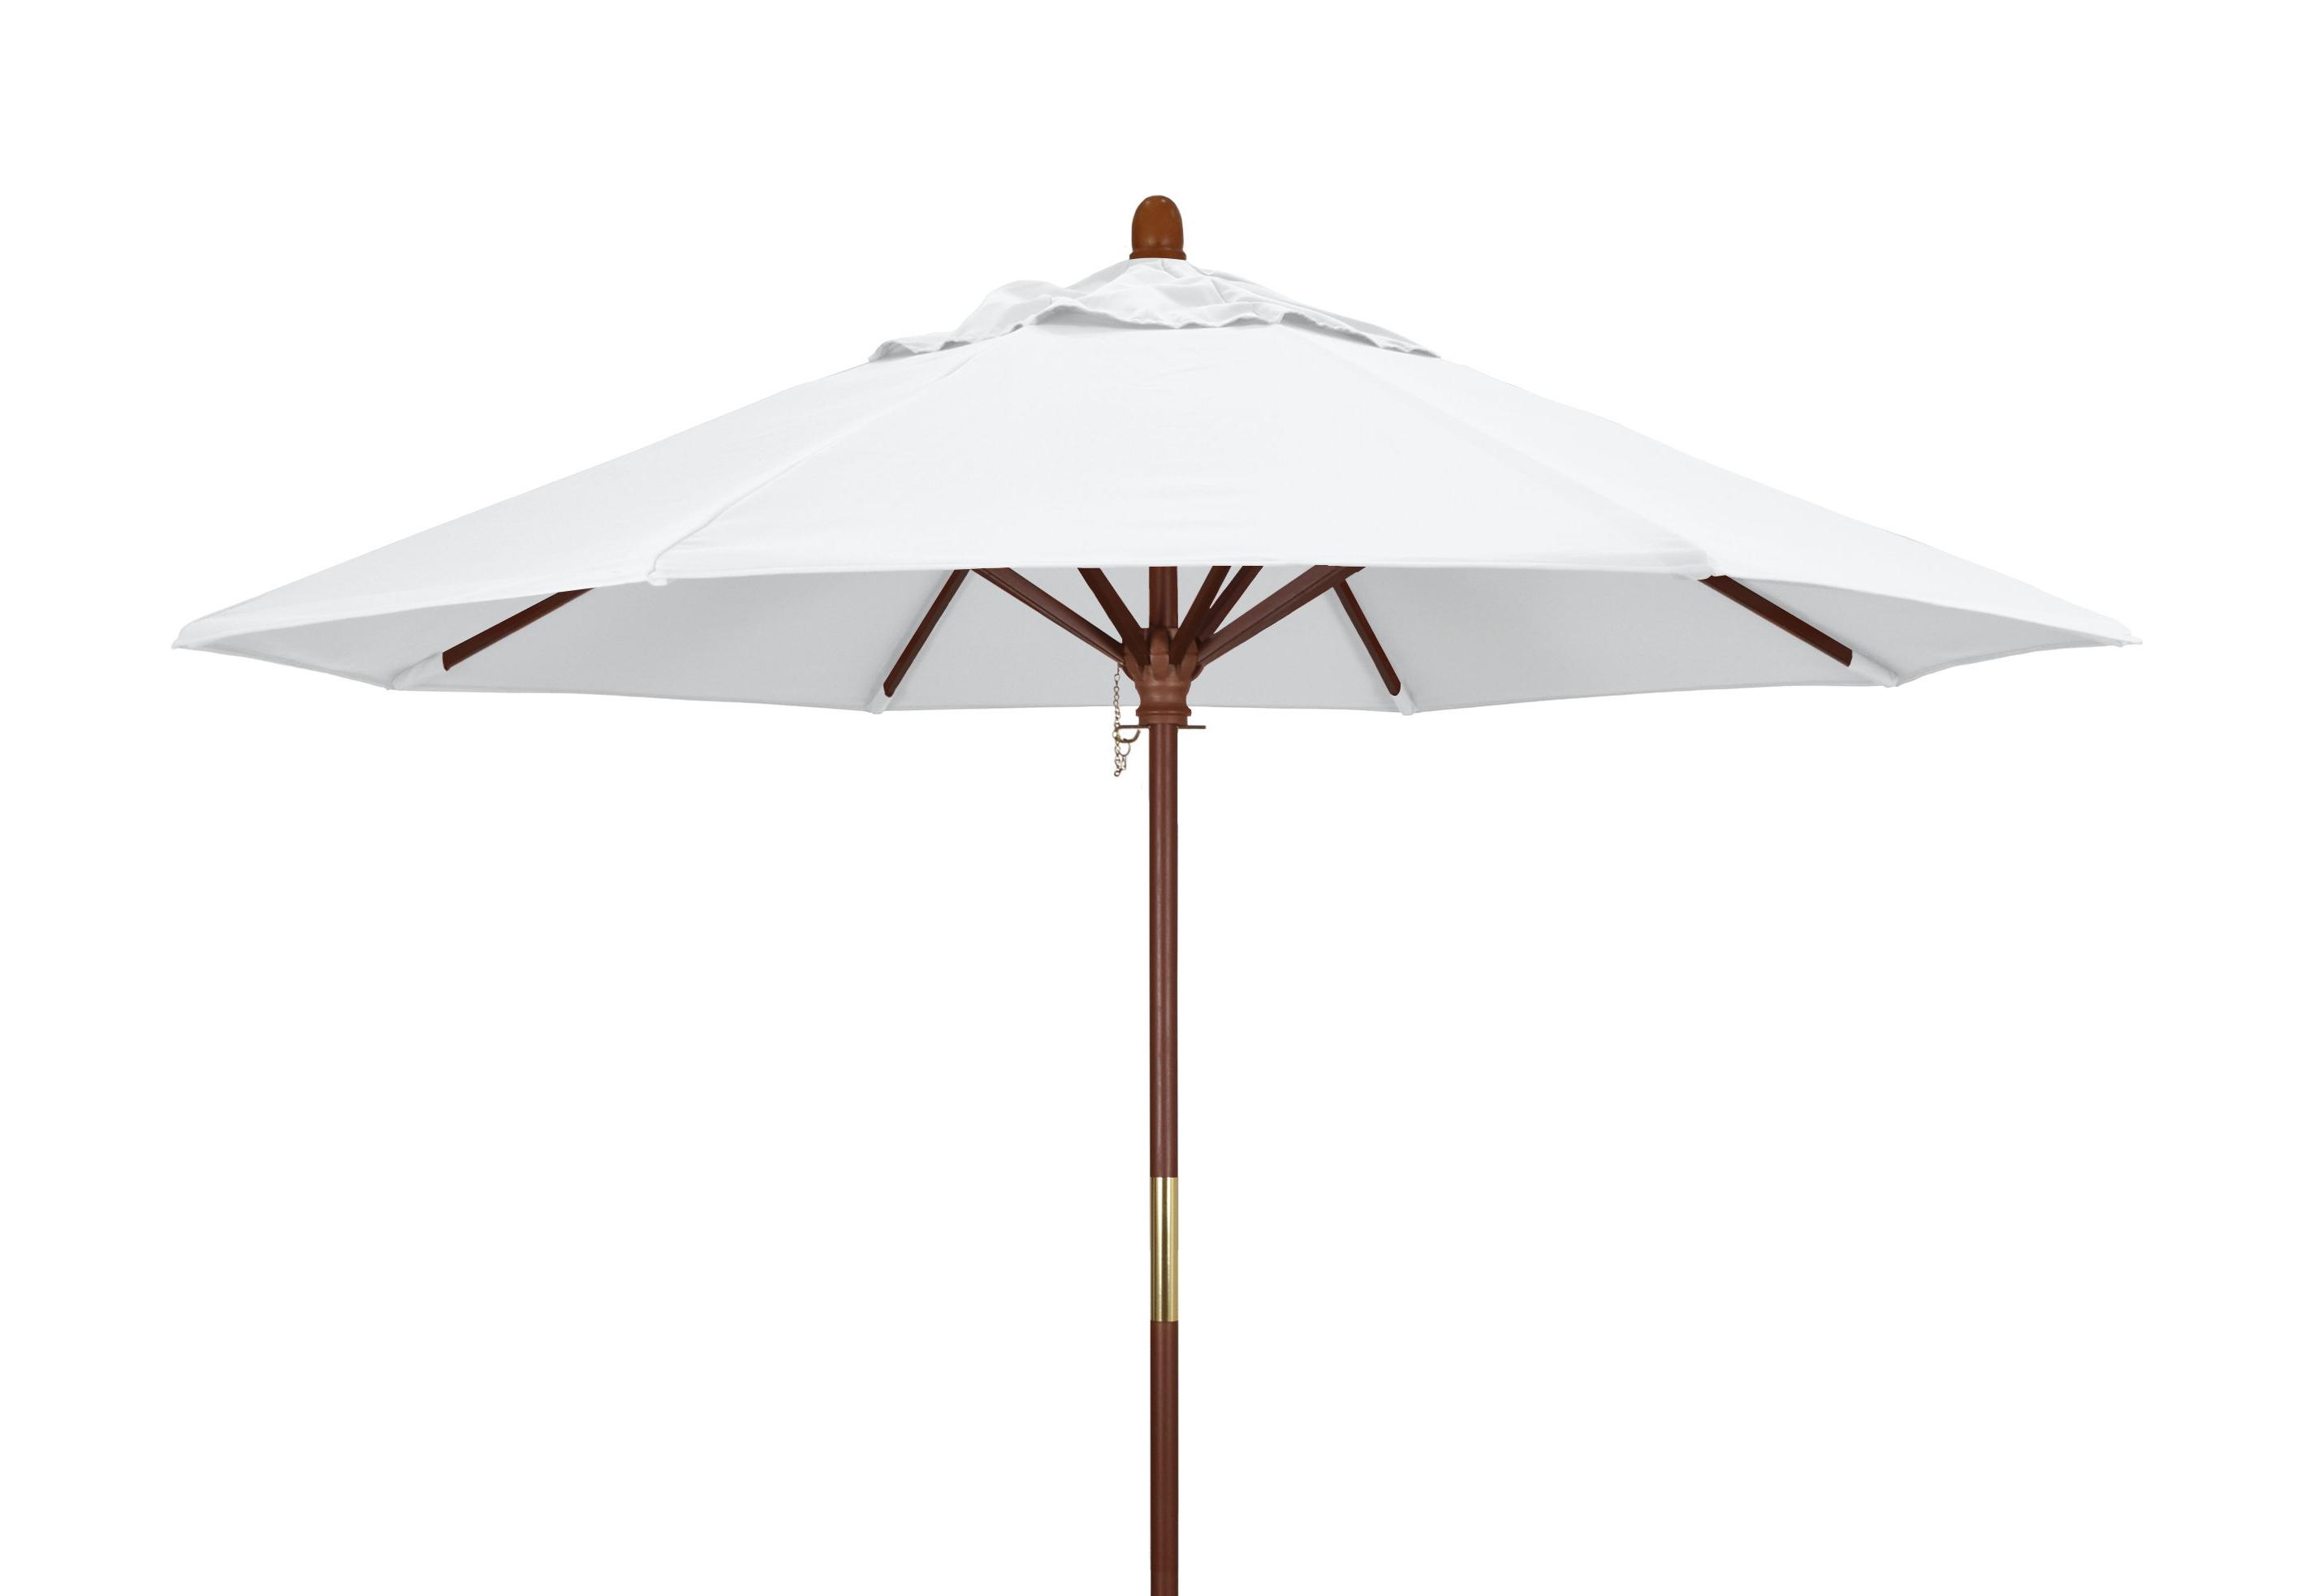 Mraz 9' Market Umbrella Pertaining To Most Up To Date Priscilla Market Umbrellas (View 11 of 20)